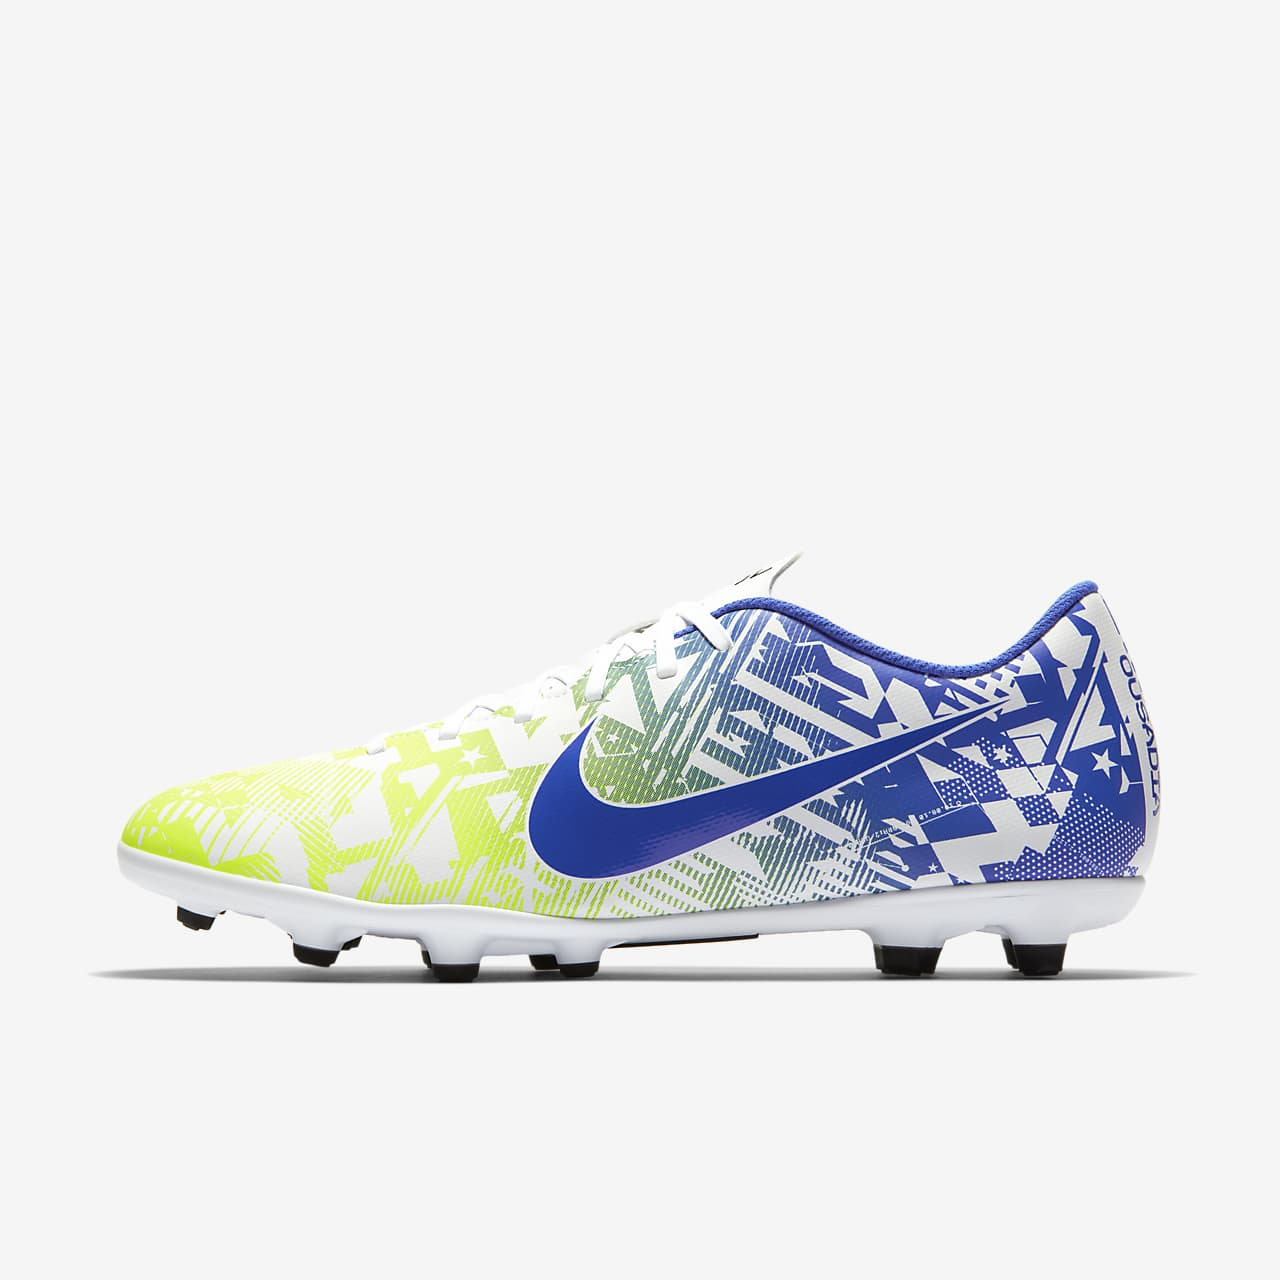 Nike Mercurial Vapor 13 Club Neymar Jr